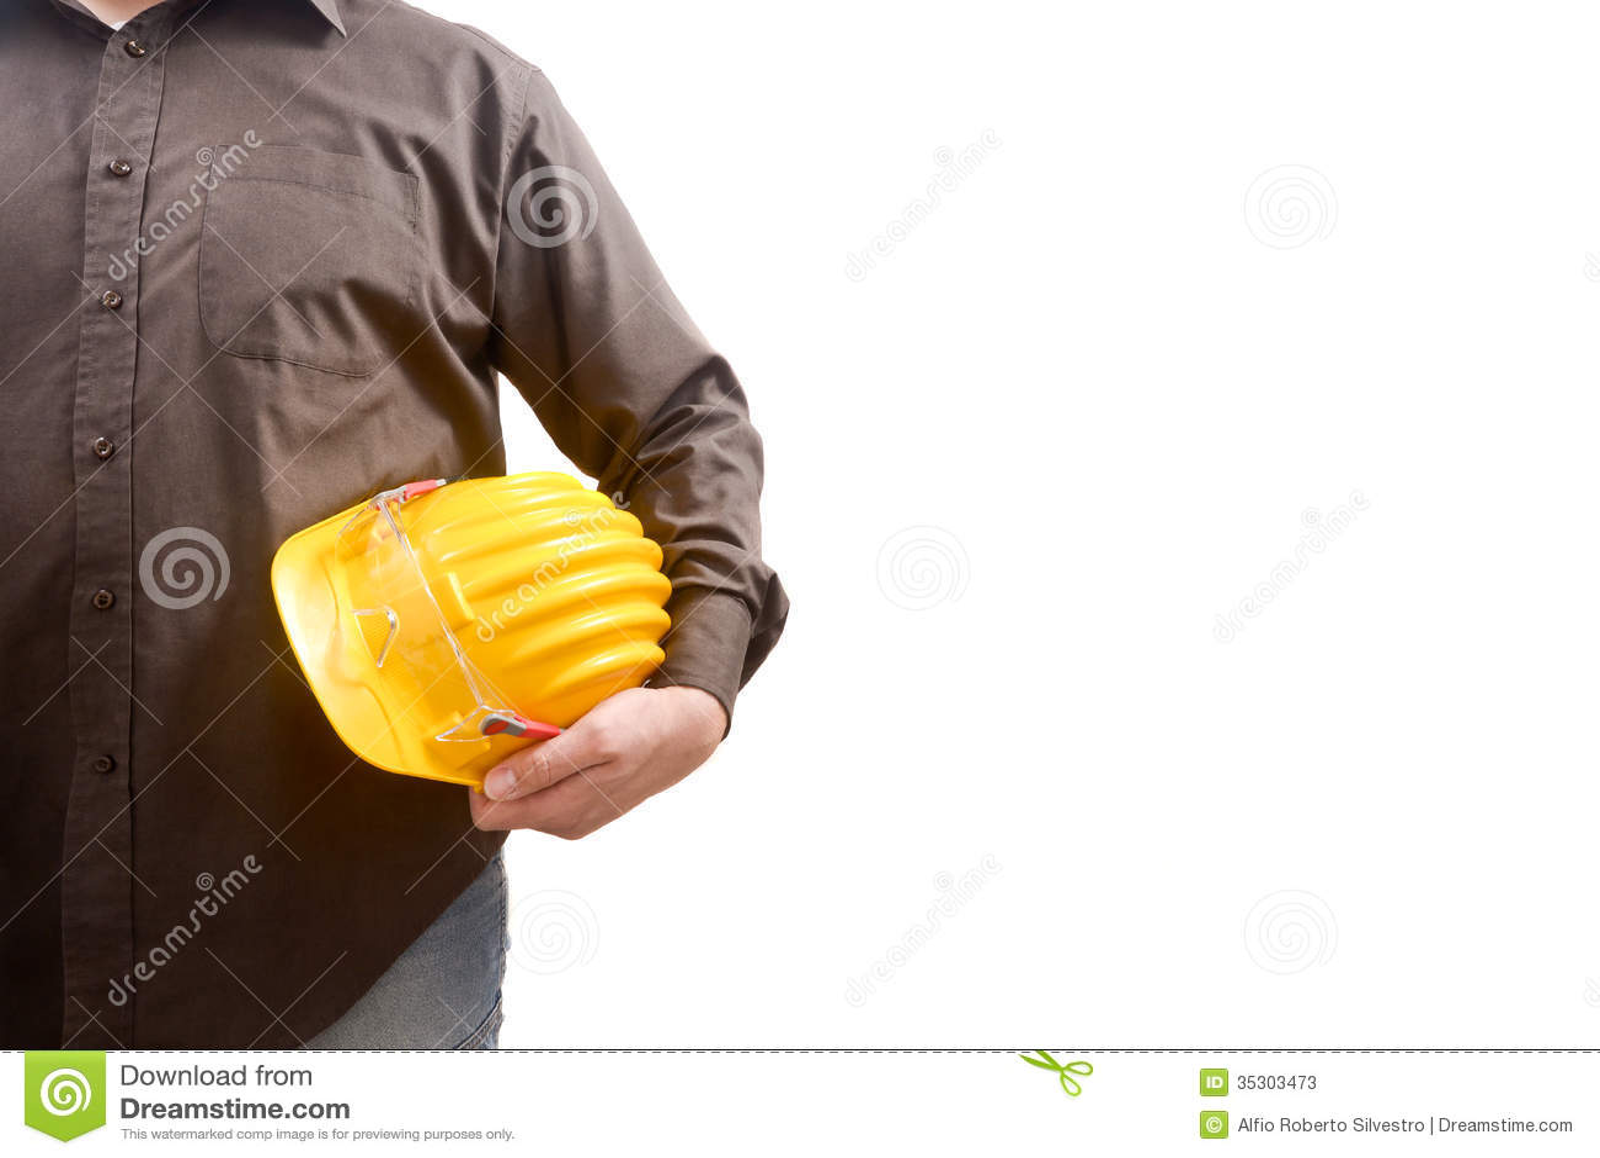 Someone career giving a hand job cutie